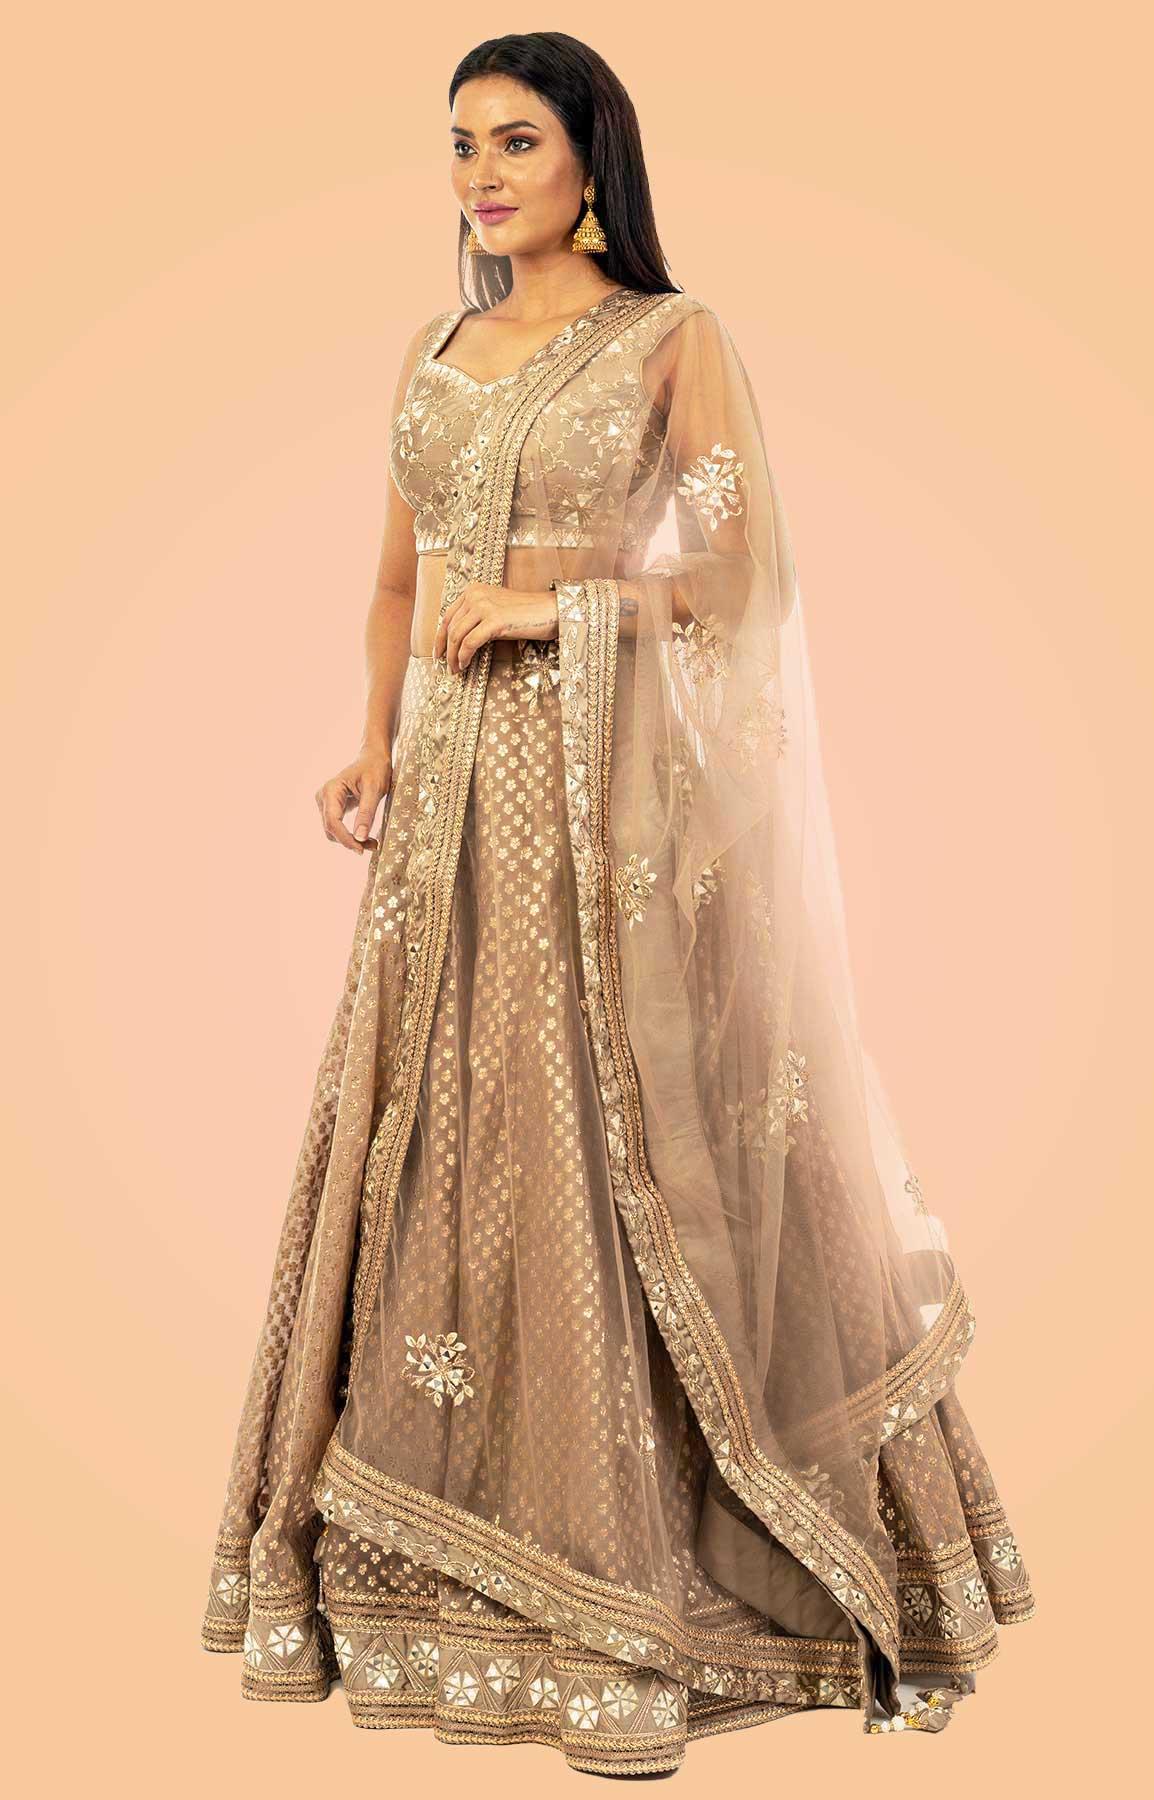 Sepia Banarasi Chanderi Silk Lehenga  – Viraaya By Ushnakmals